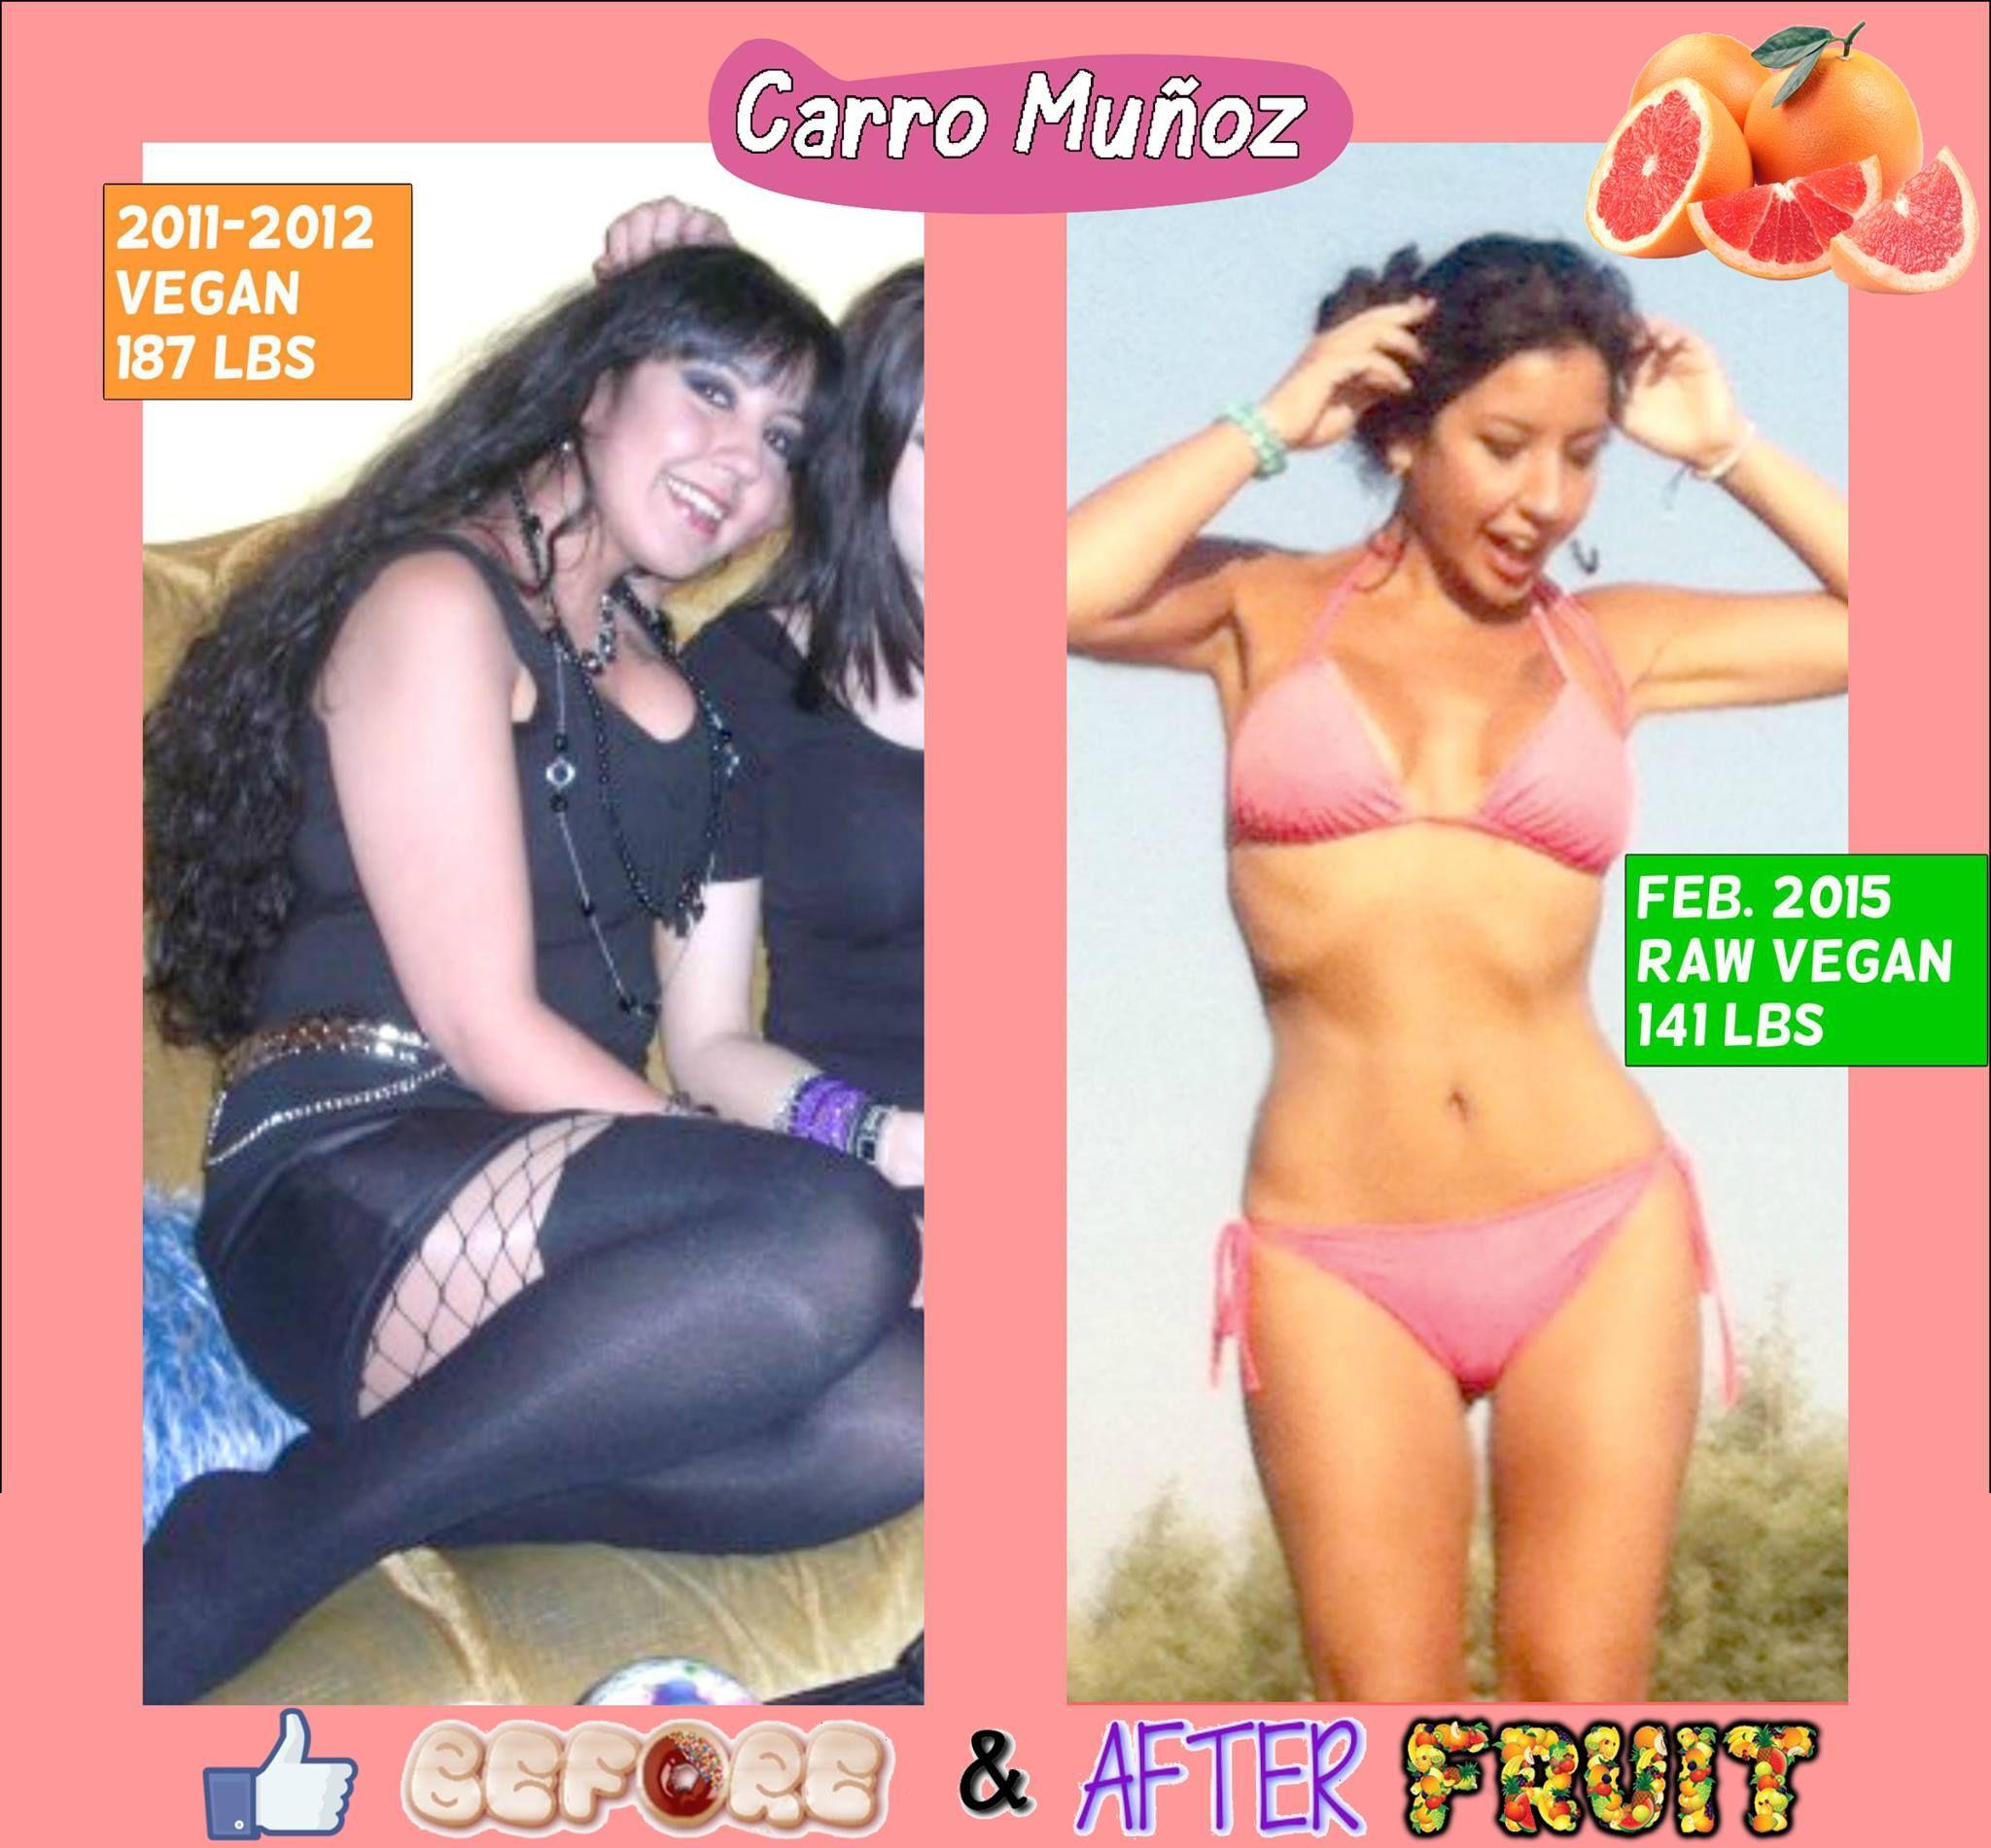 This Is Carro Munoz On A Raw Vegan Diet Instagram